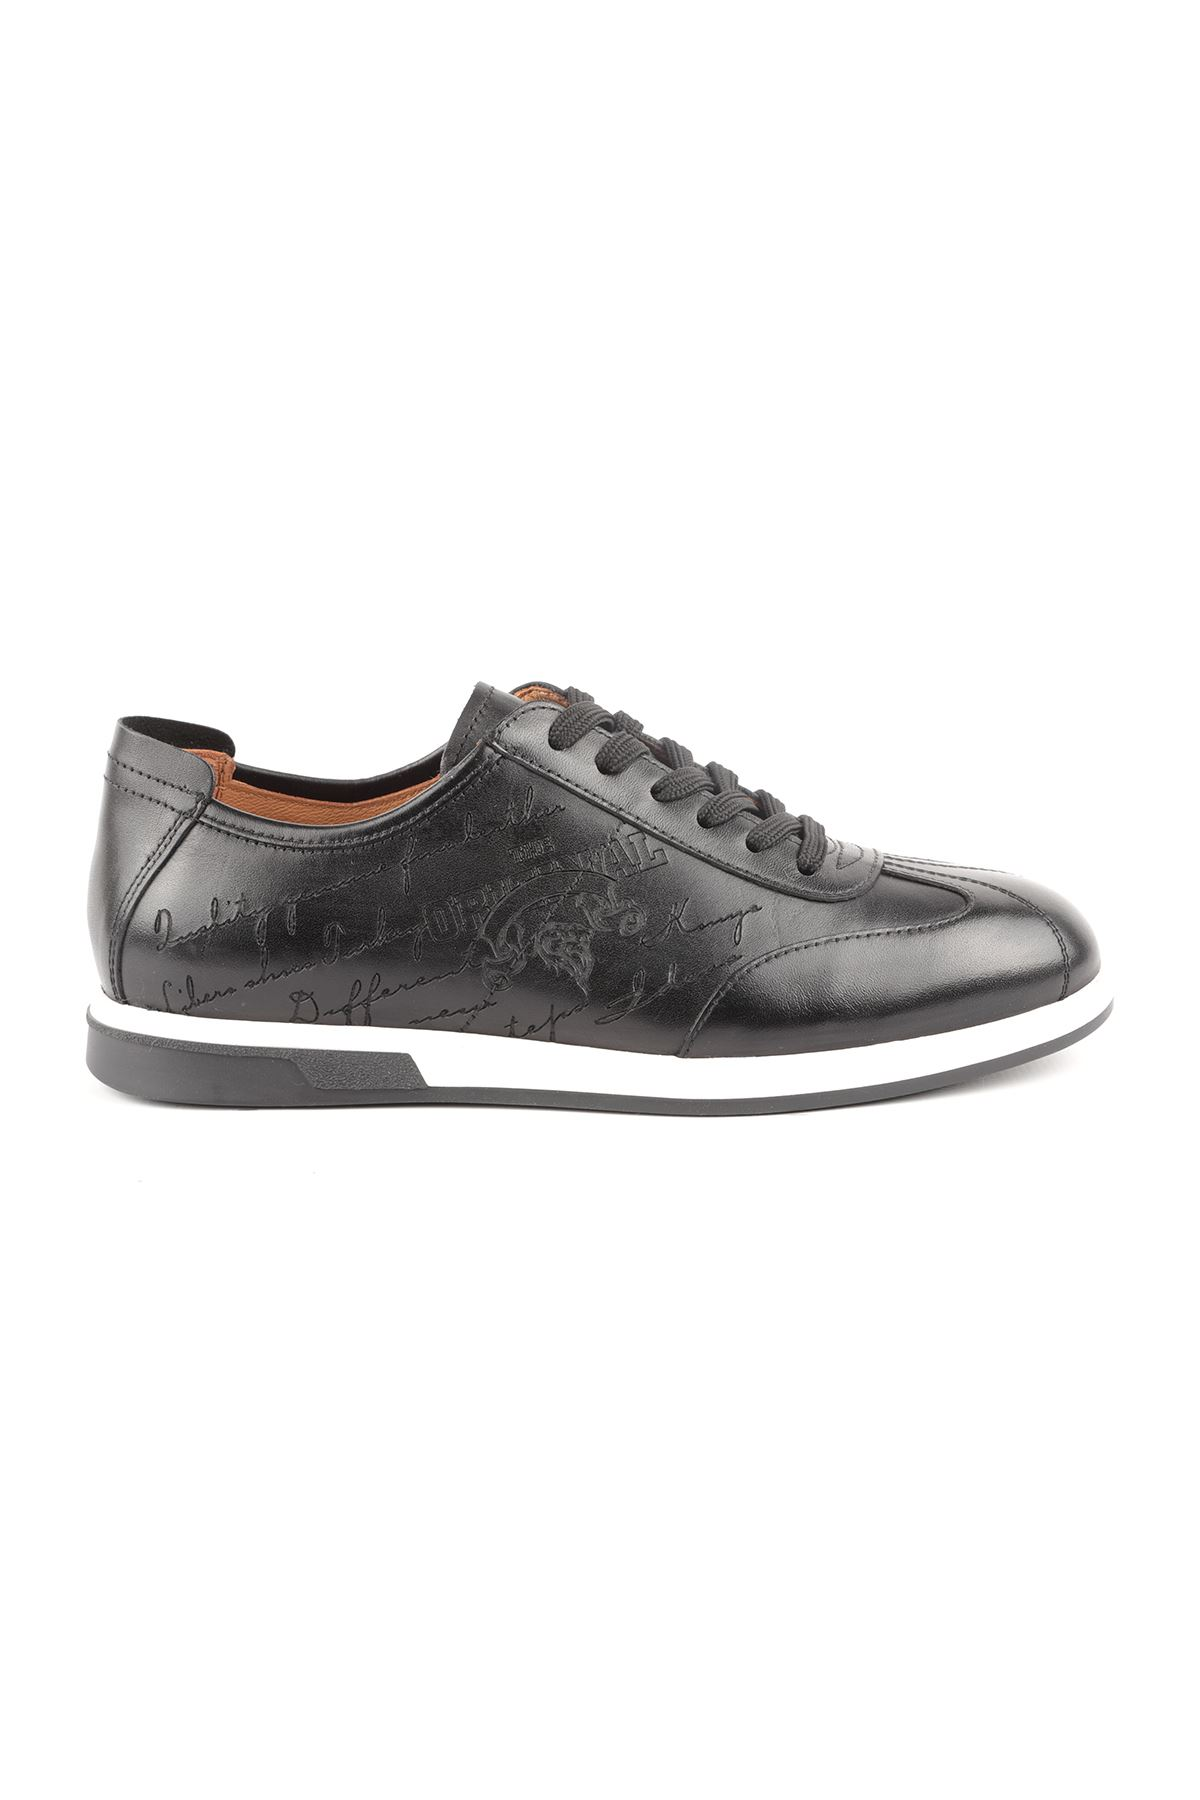 Libero L3772 Black Men's Sport Shoes